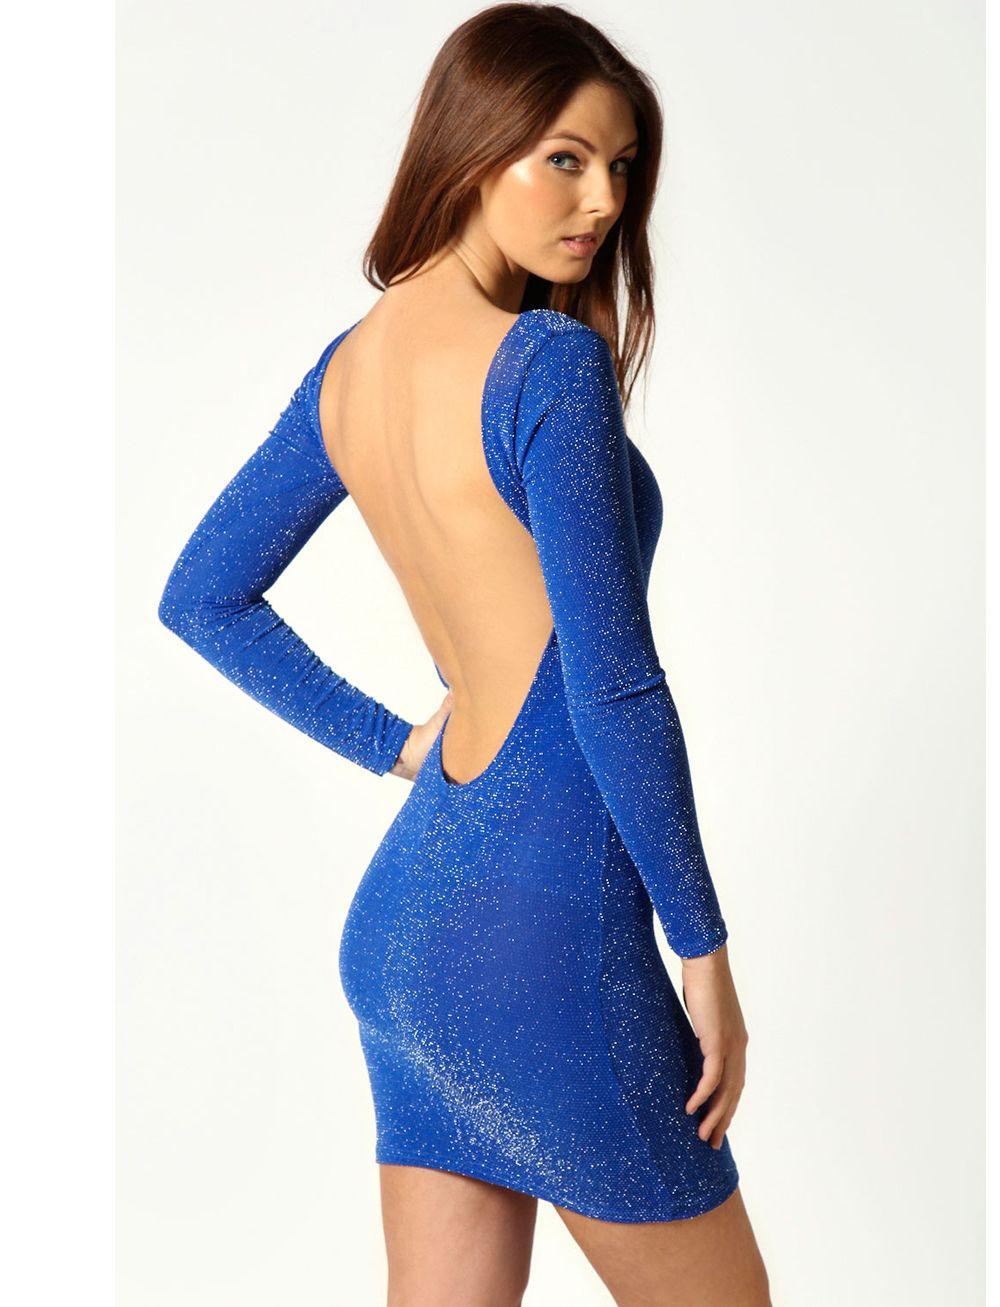 Blue Long Sleeve Backless Bodycon Dress - Sheinside.com | Formal ...